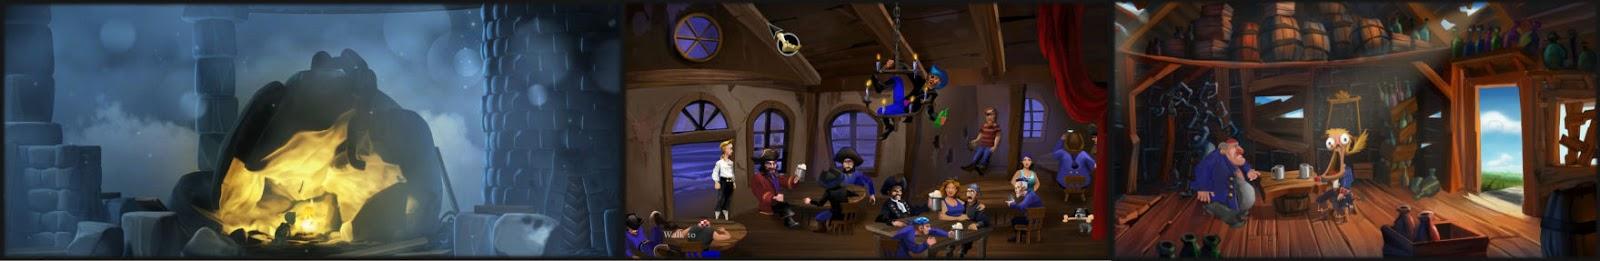 Telltale Games Adventure Mystery